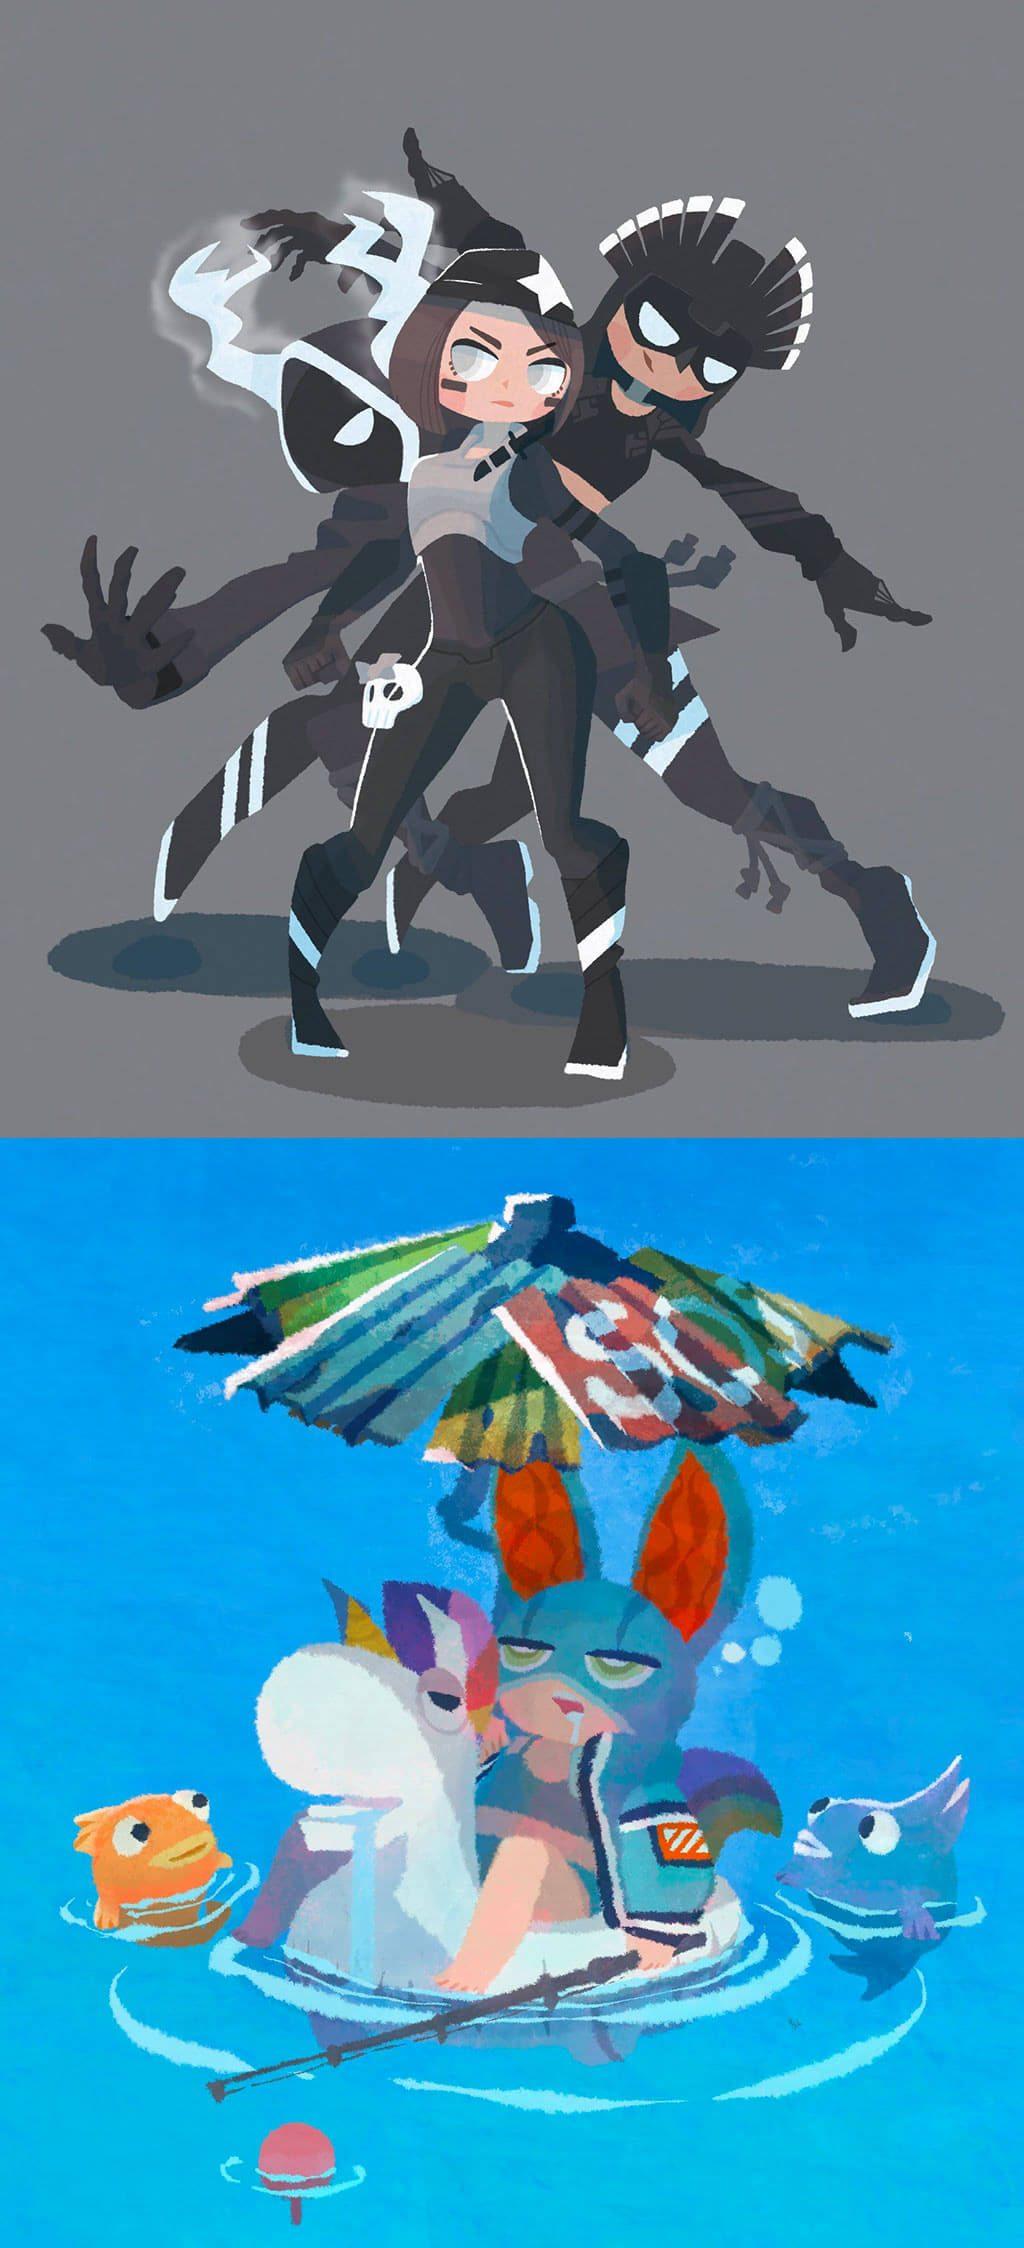 Fortnite Fan Art by じんたそ@お絵描きゲーマー